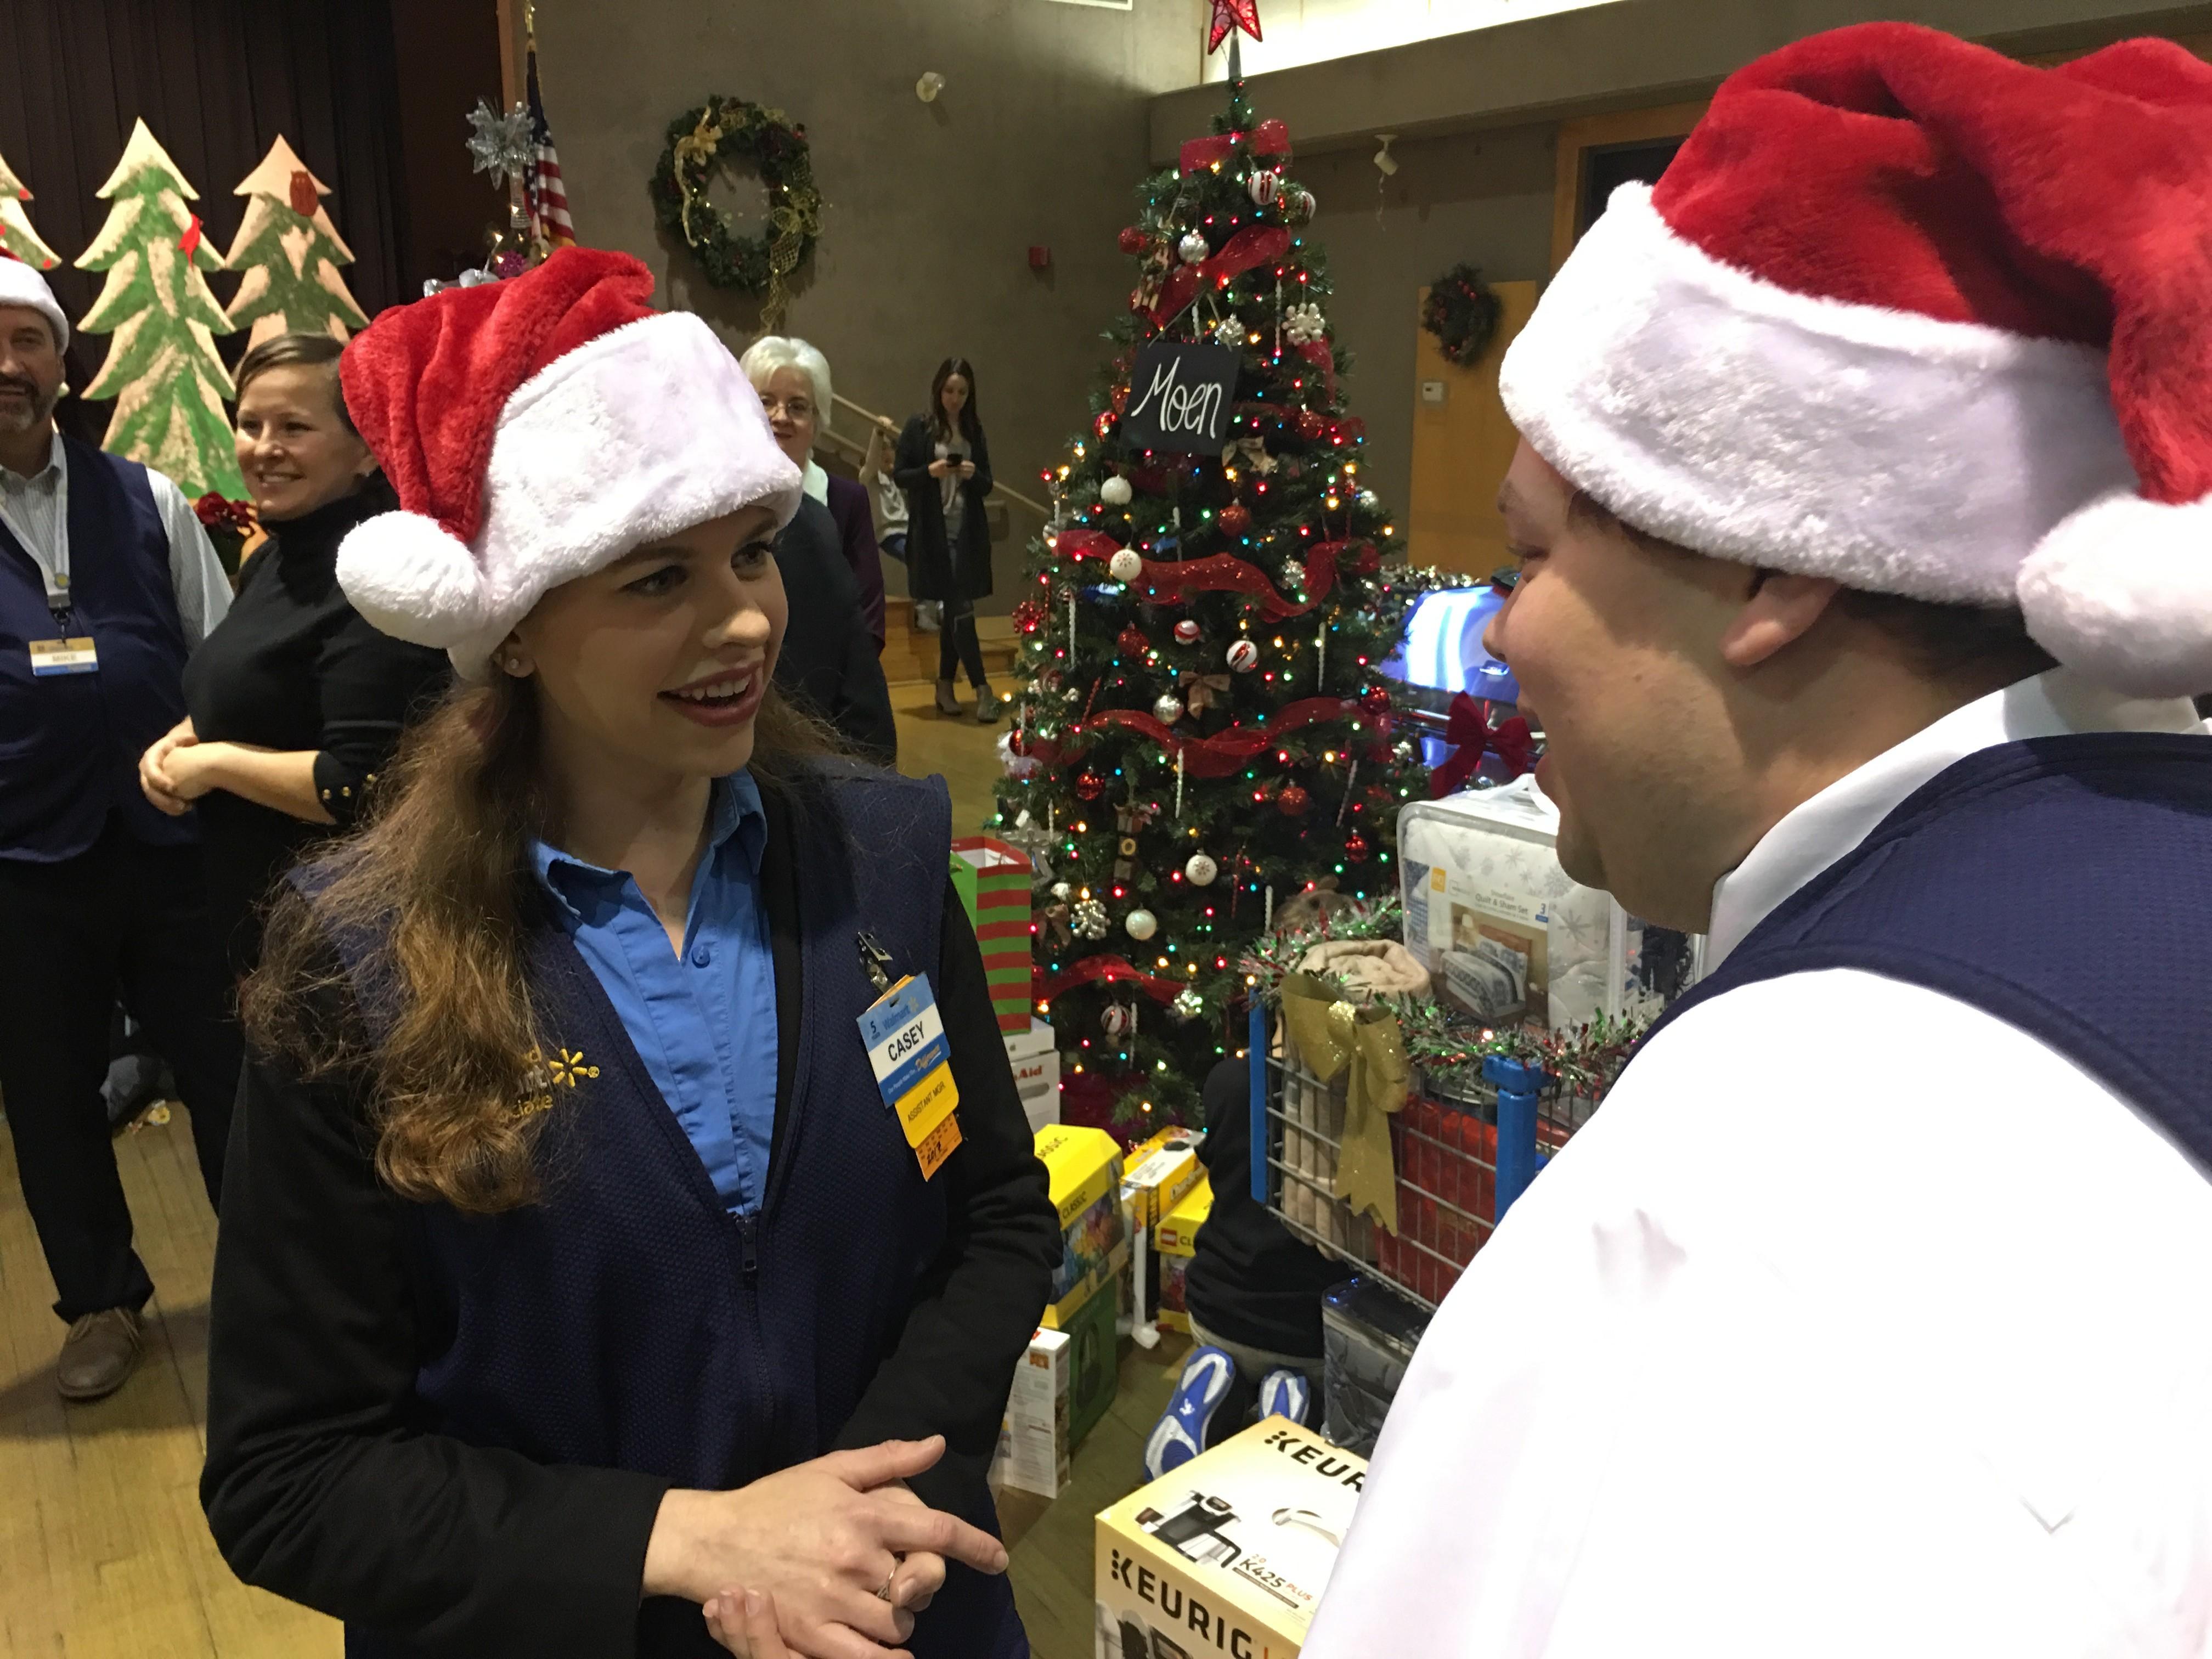 Associates talking in Santa hats near a Christmas tree